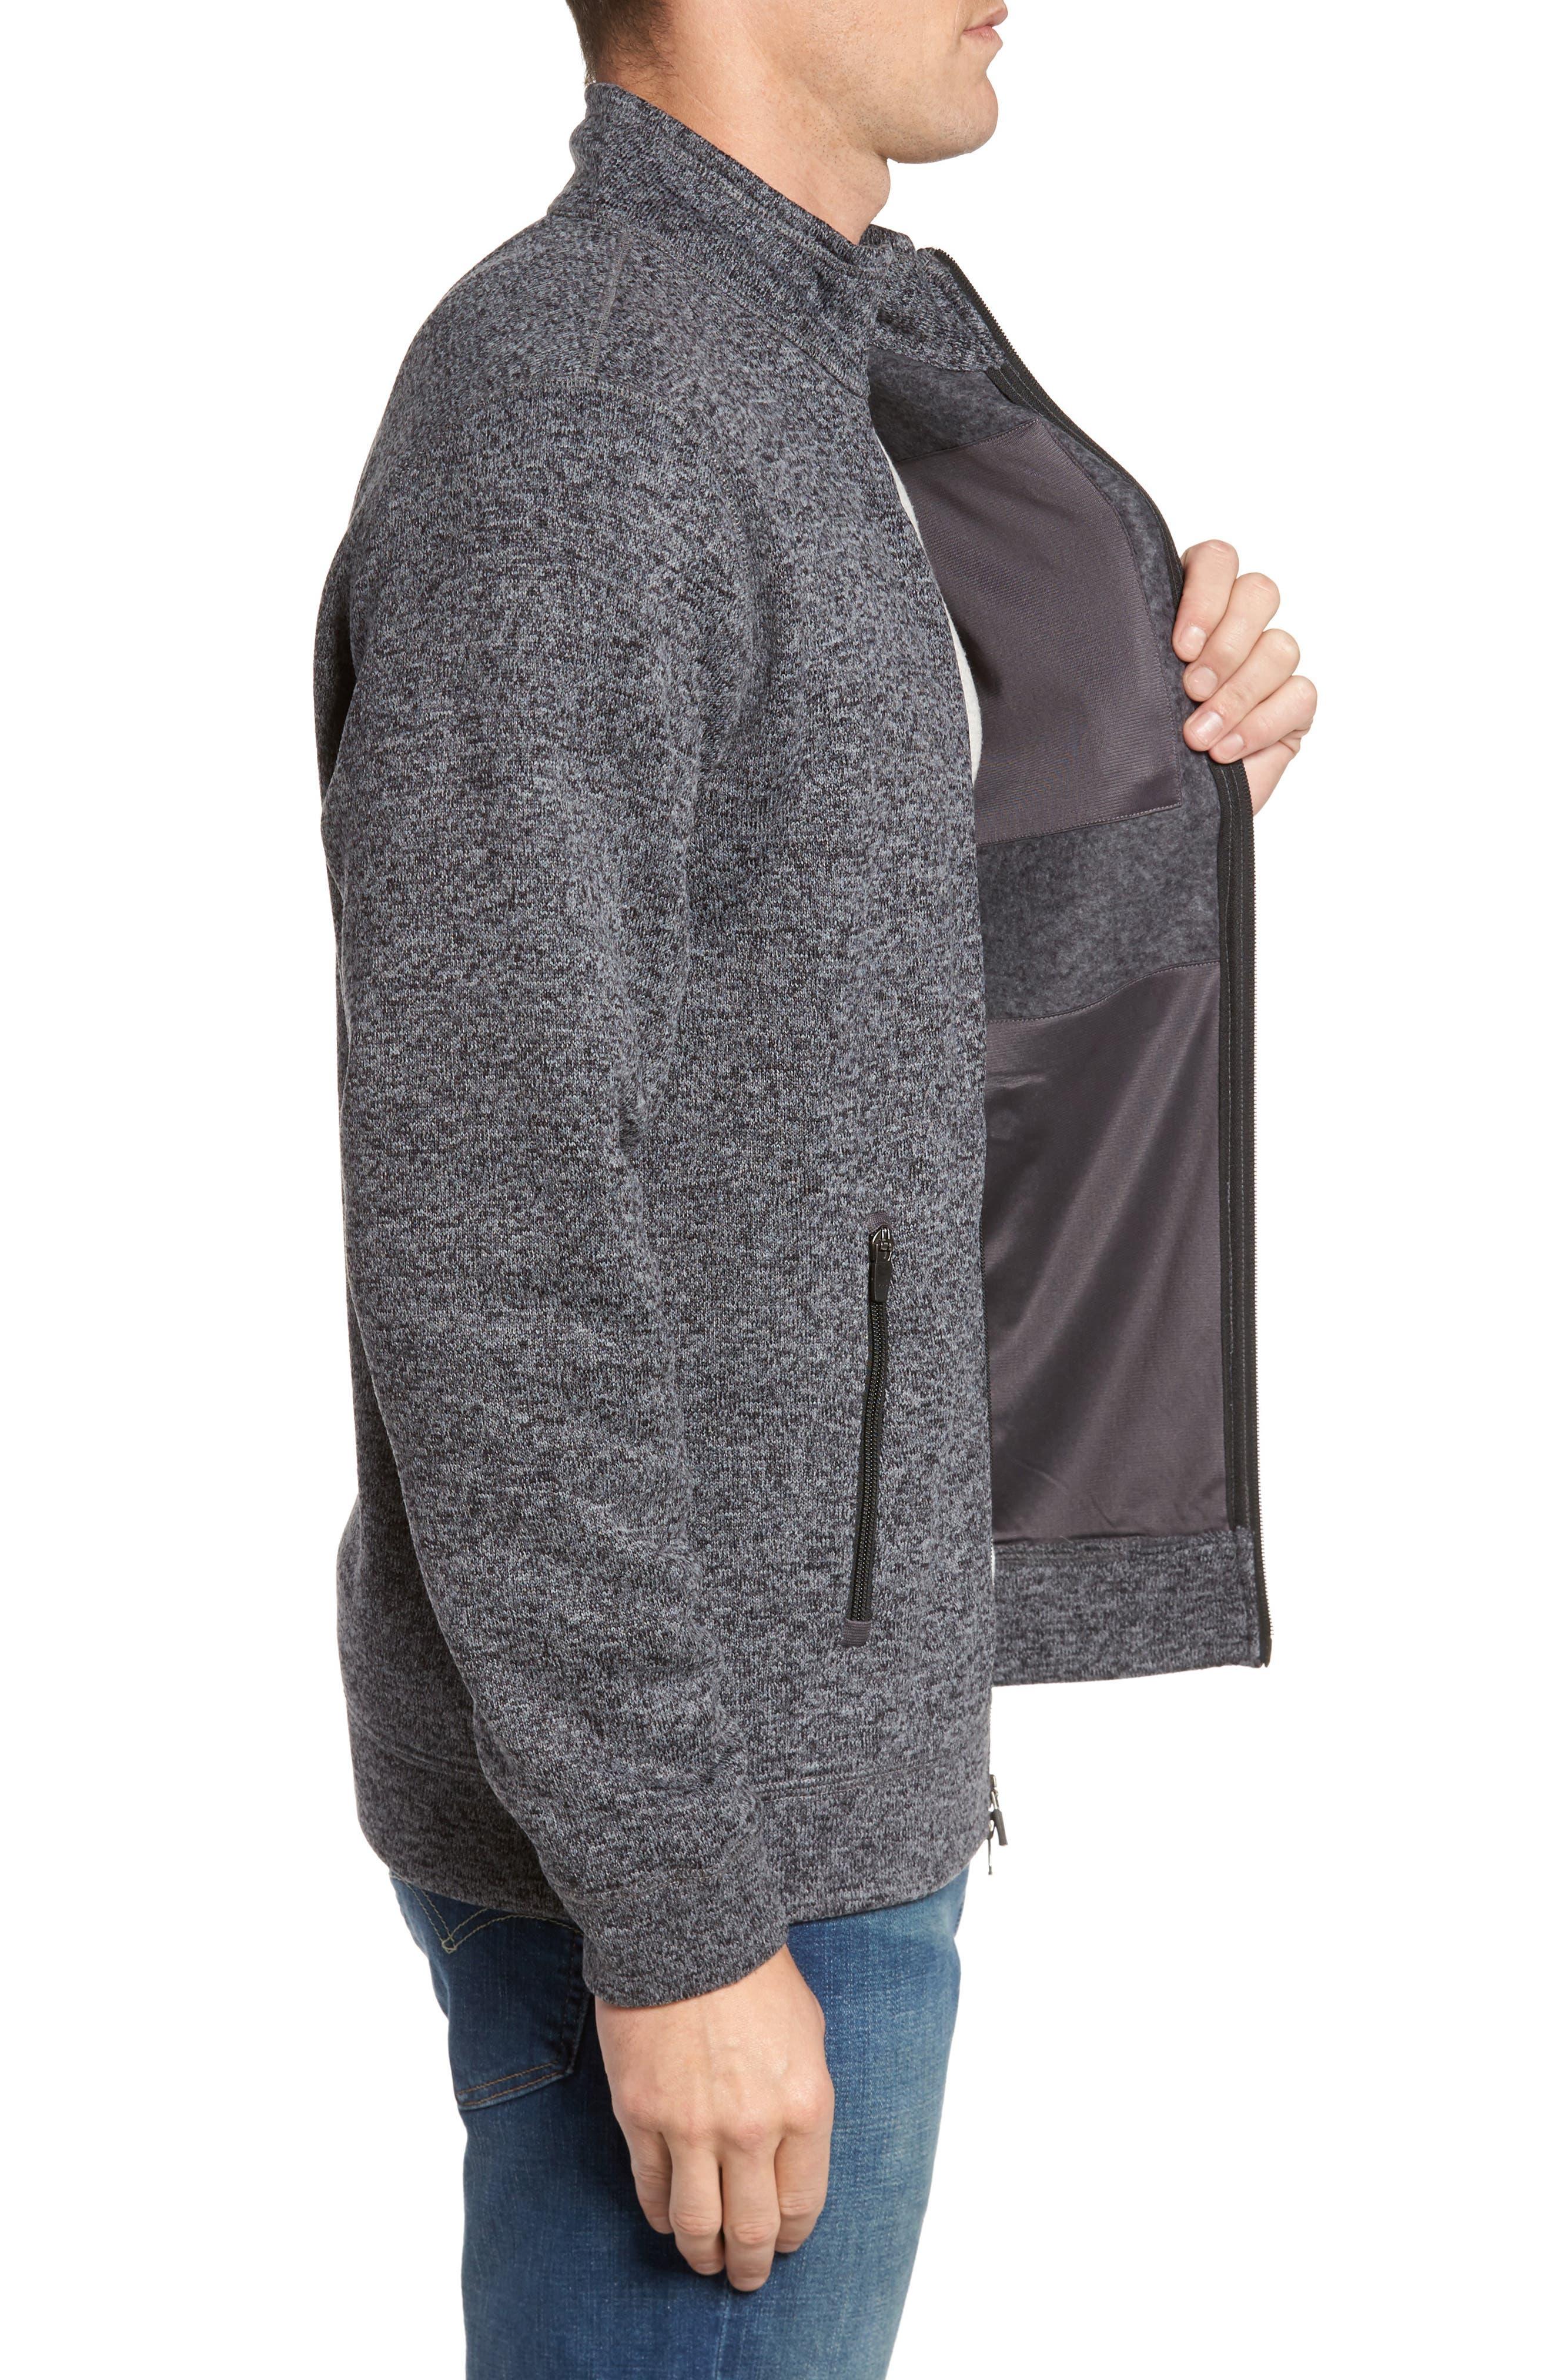 Sweater Knit Fleece Zip Front Jacket,                             Alternate thumbnail 7, color,